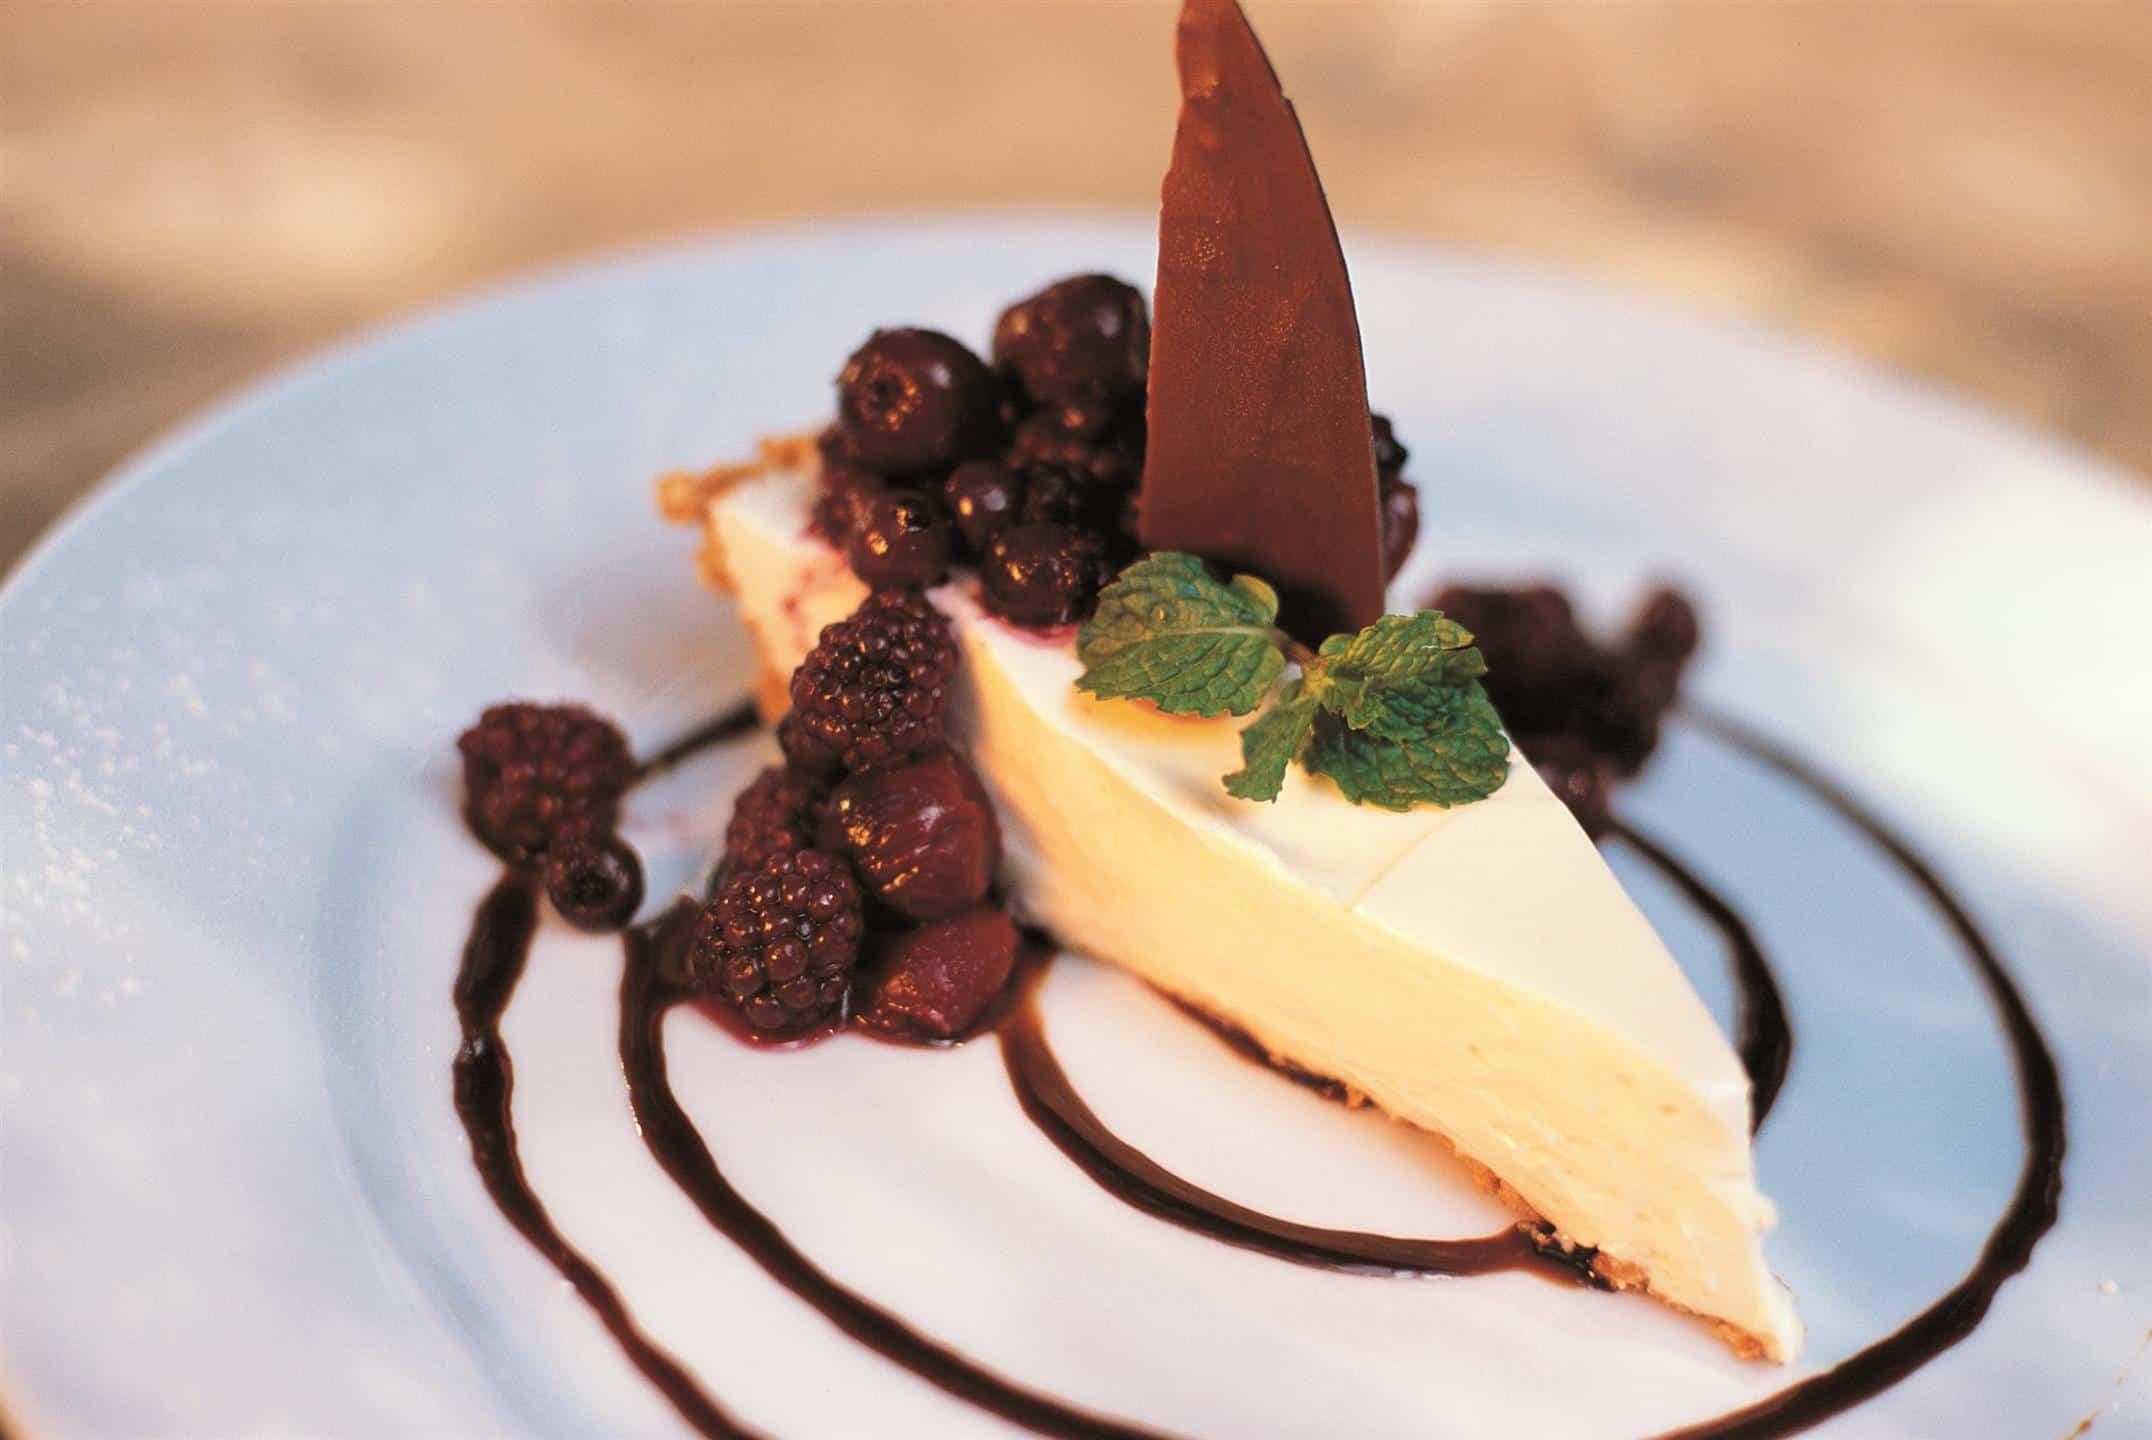 Dessert at Pondoro